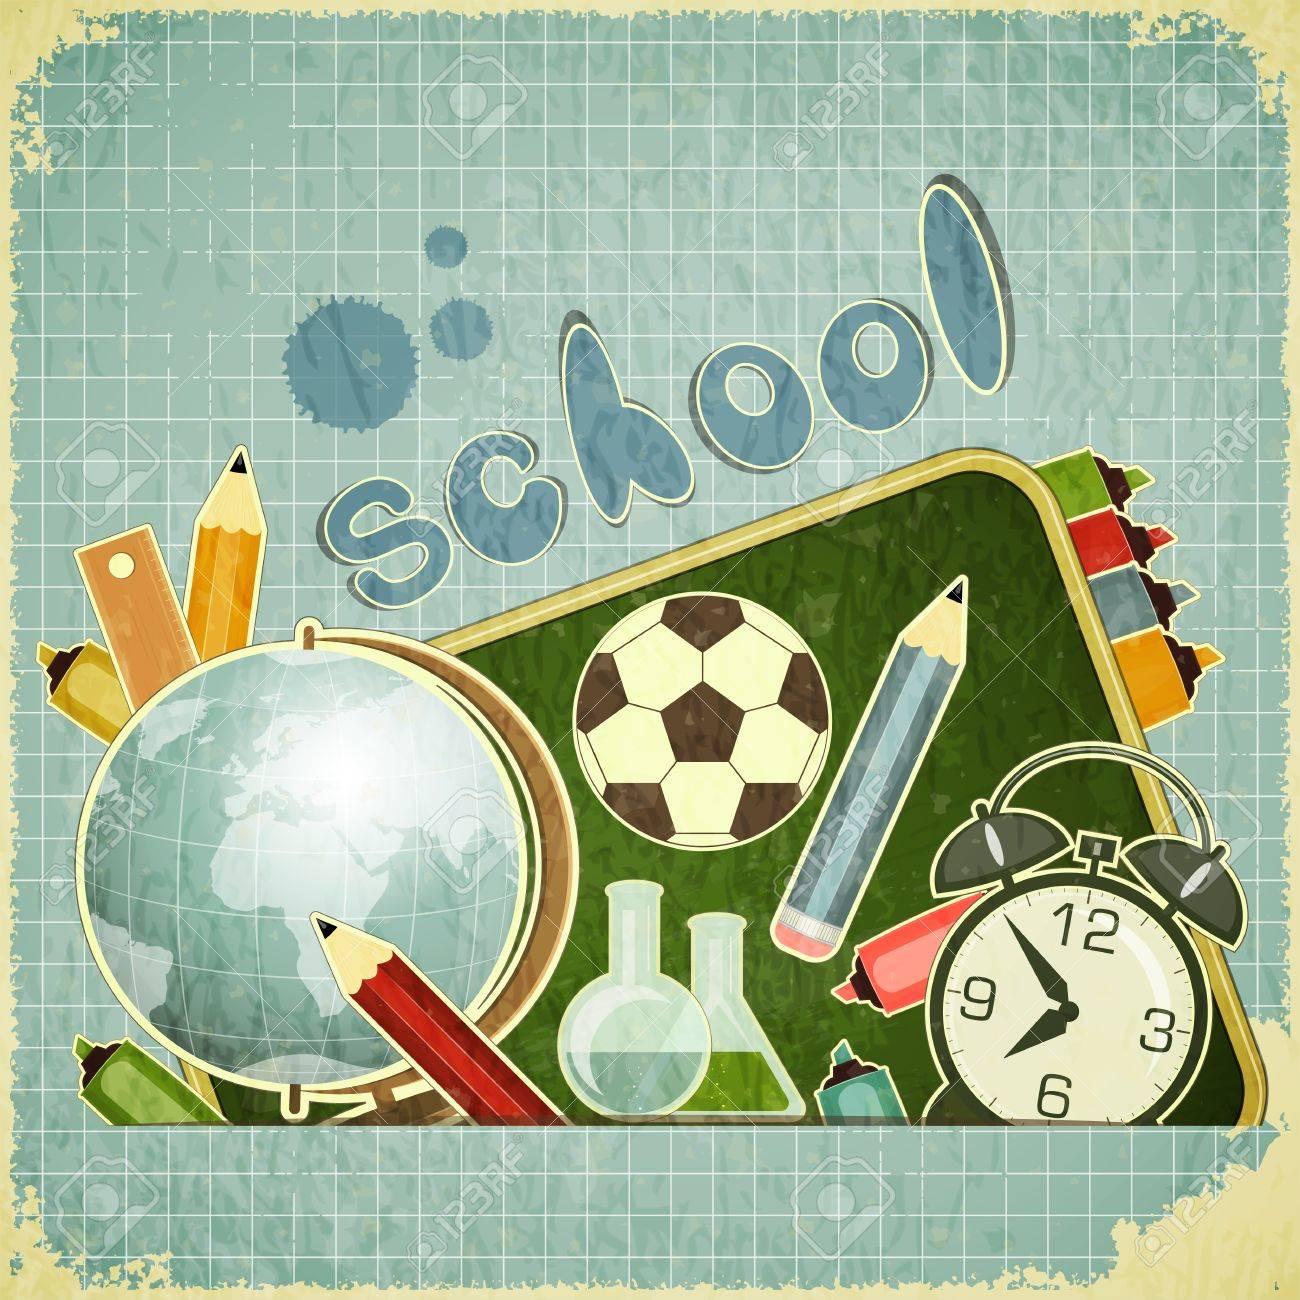 Retro card - back to school Design - School Board and School Supplies on blue vintage background - vector illustration - 14502177